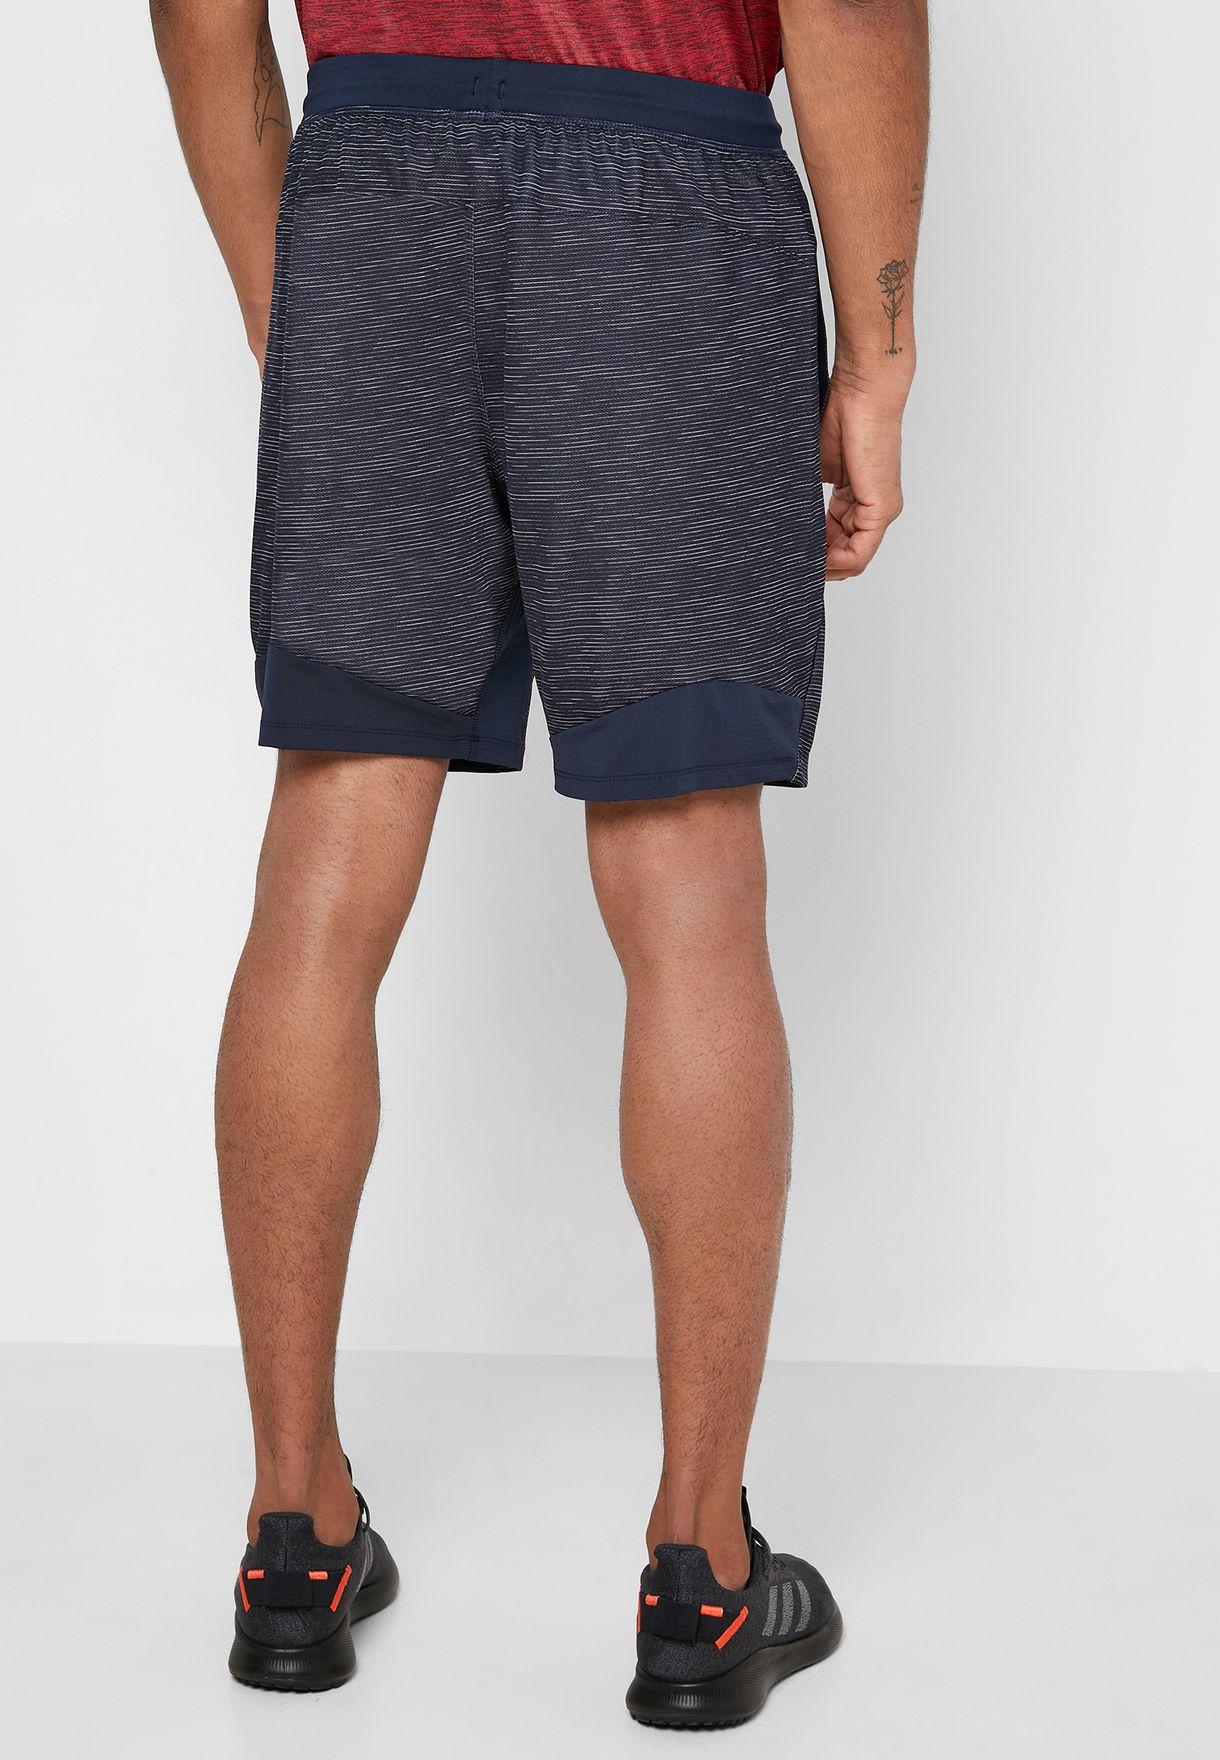 4KRFT Sport Striped Shorts